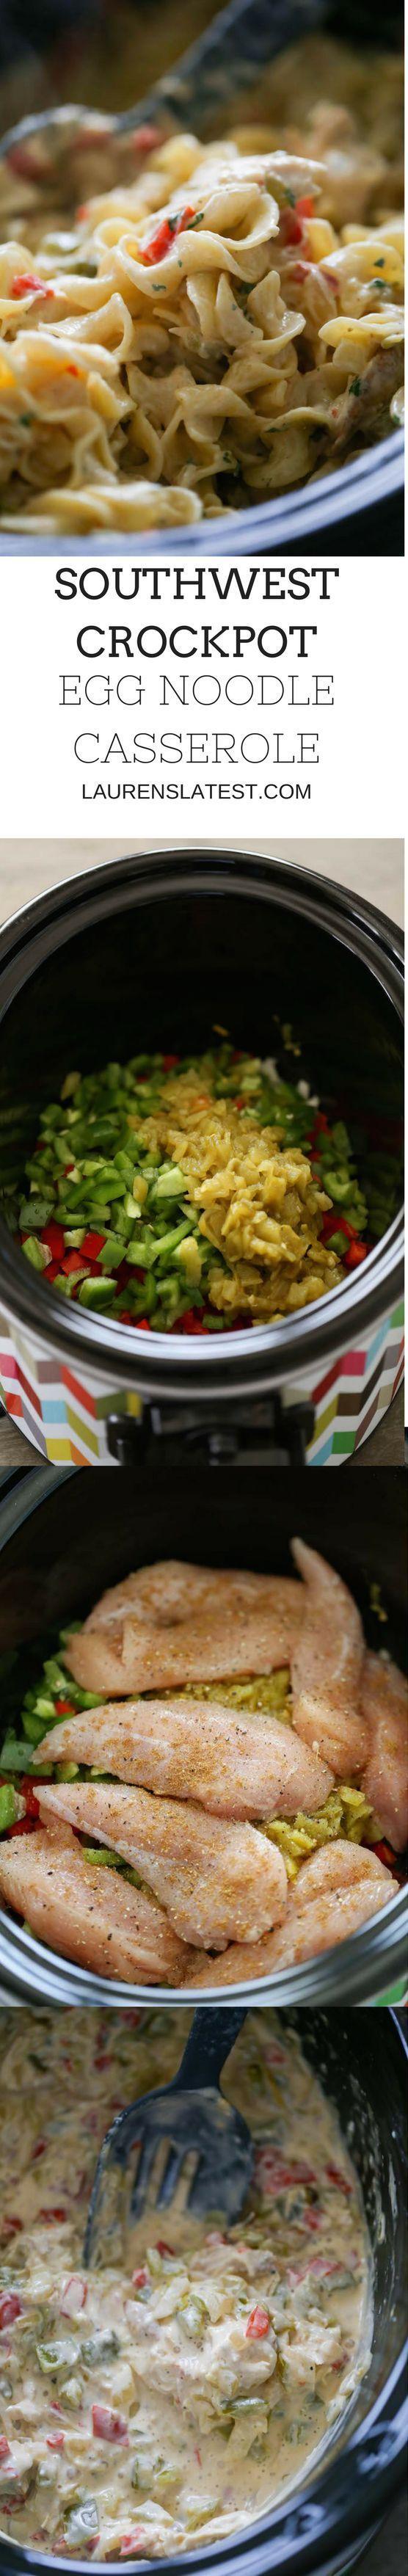 Southwest Crockpot Egg Noodle Casserole